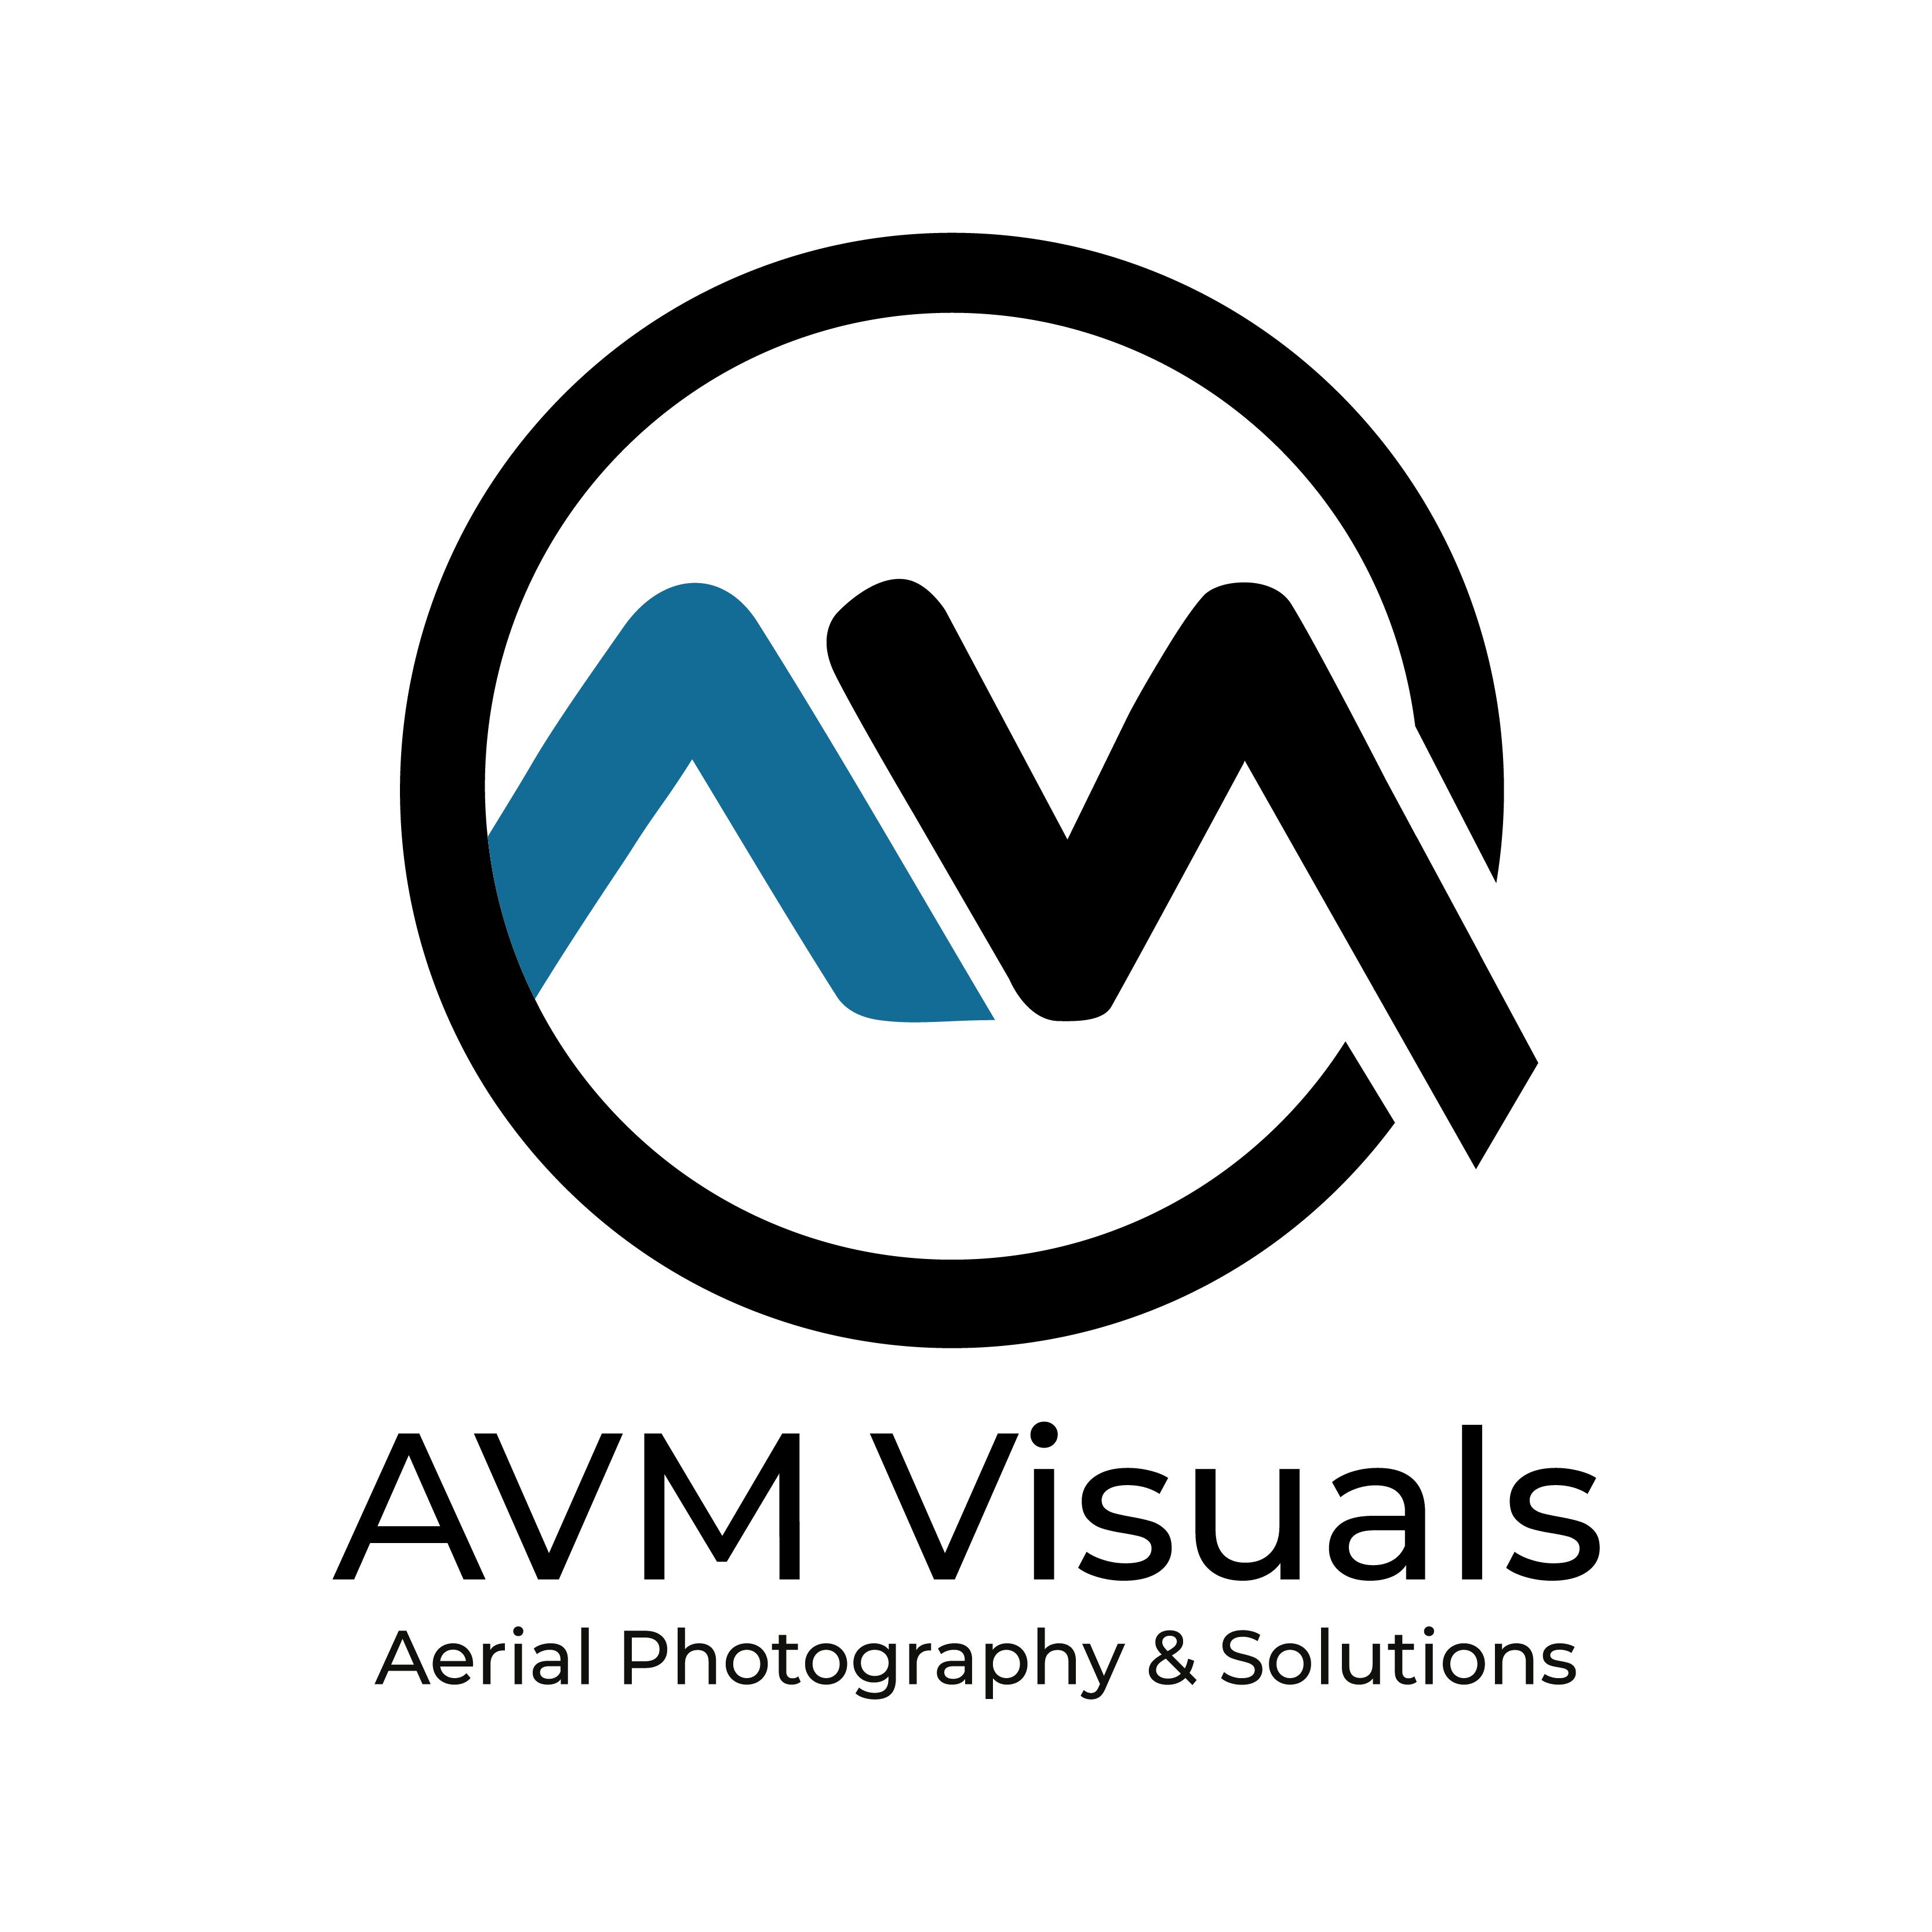 AVM Visuals